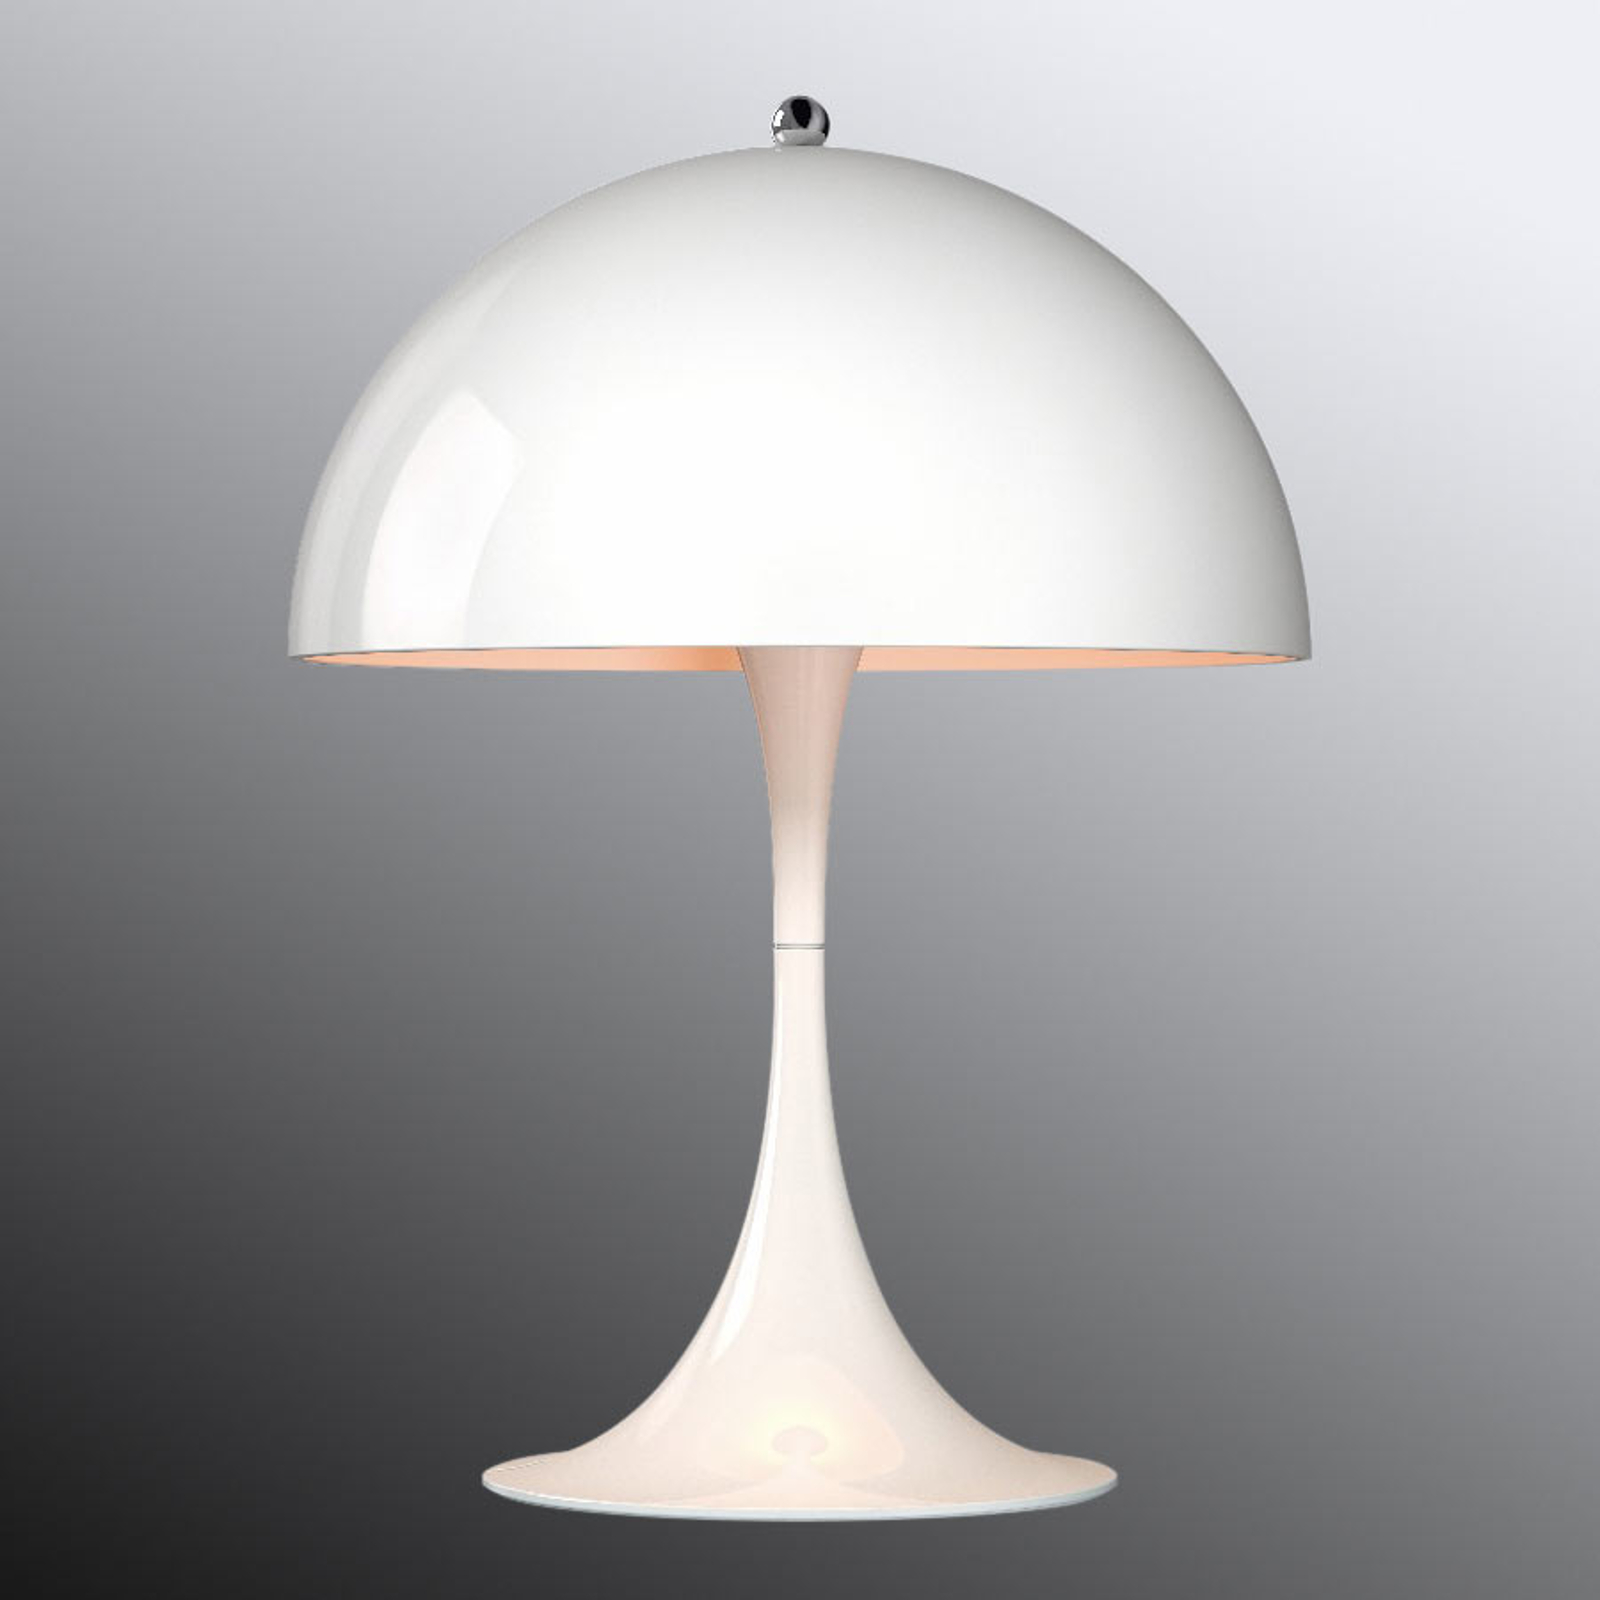 Louis Poulsen Panthella Mini Tischlampe weiß